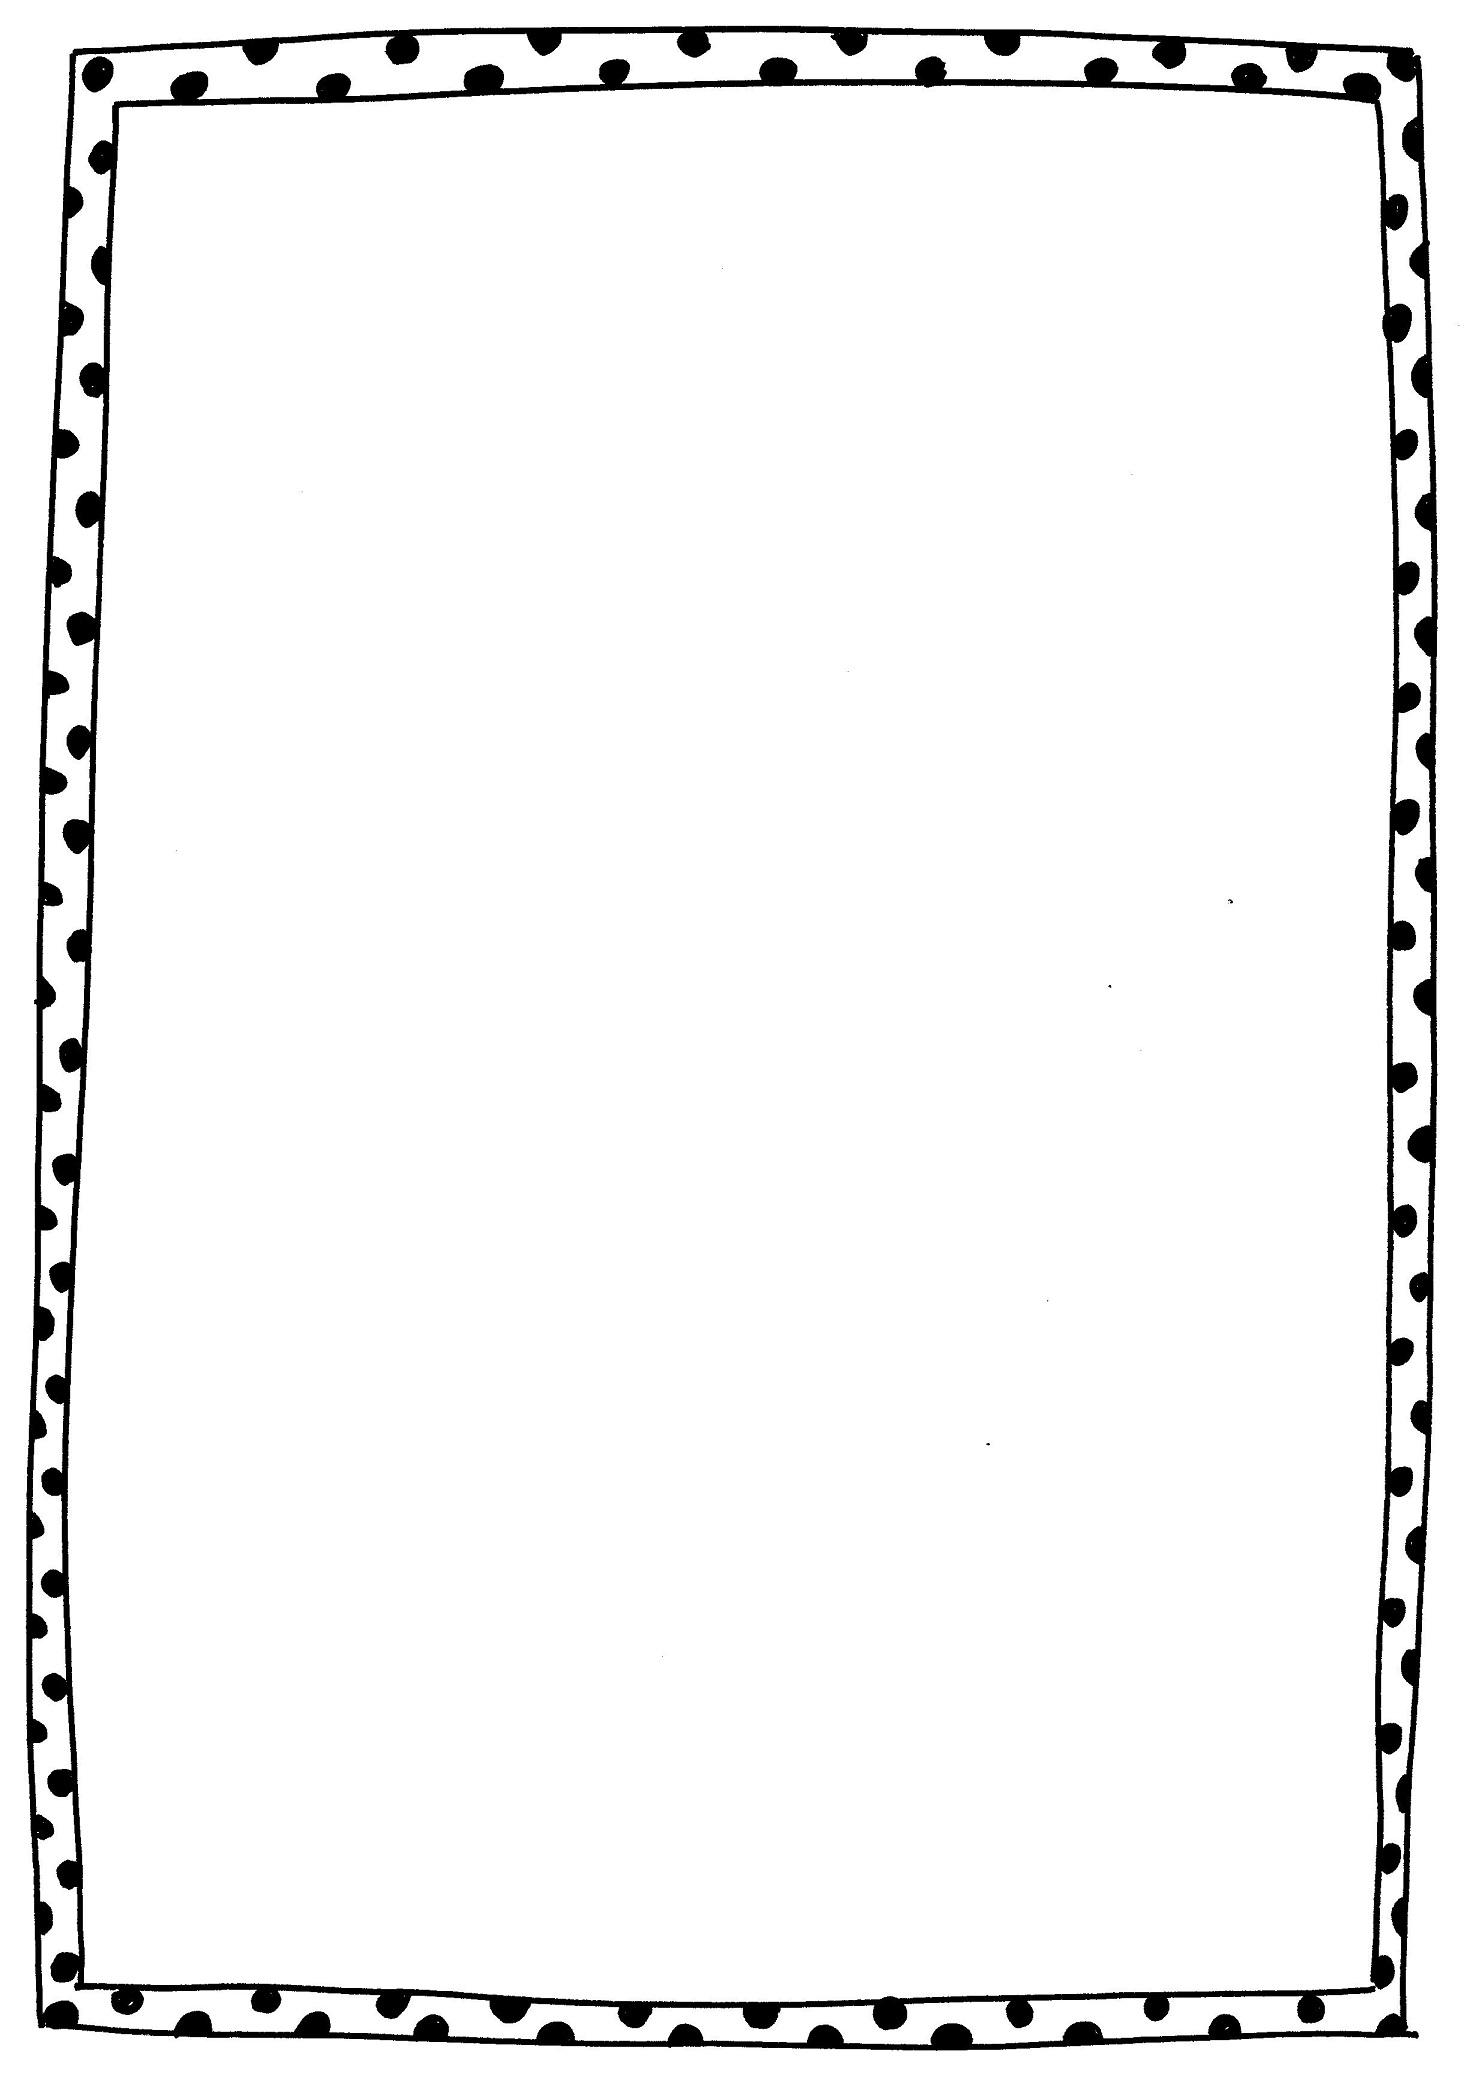 Cadre Bordure cadres et bordures